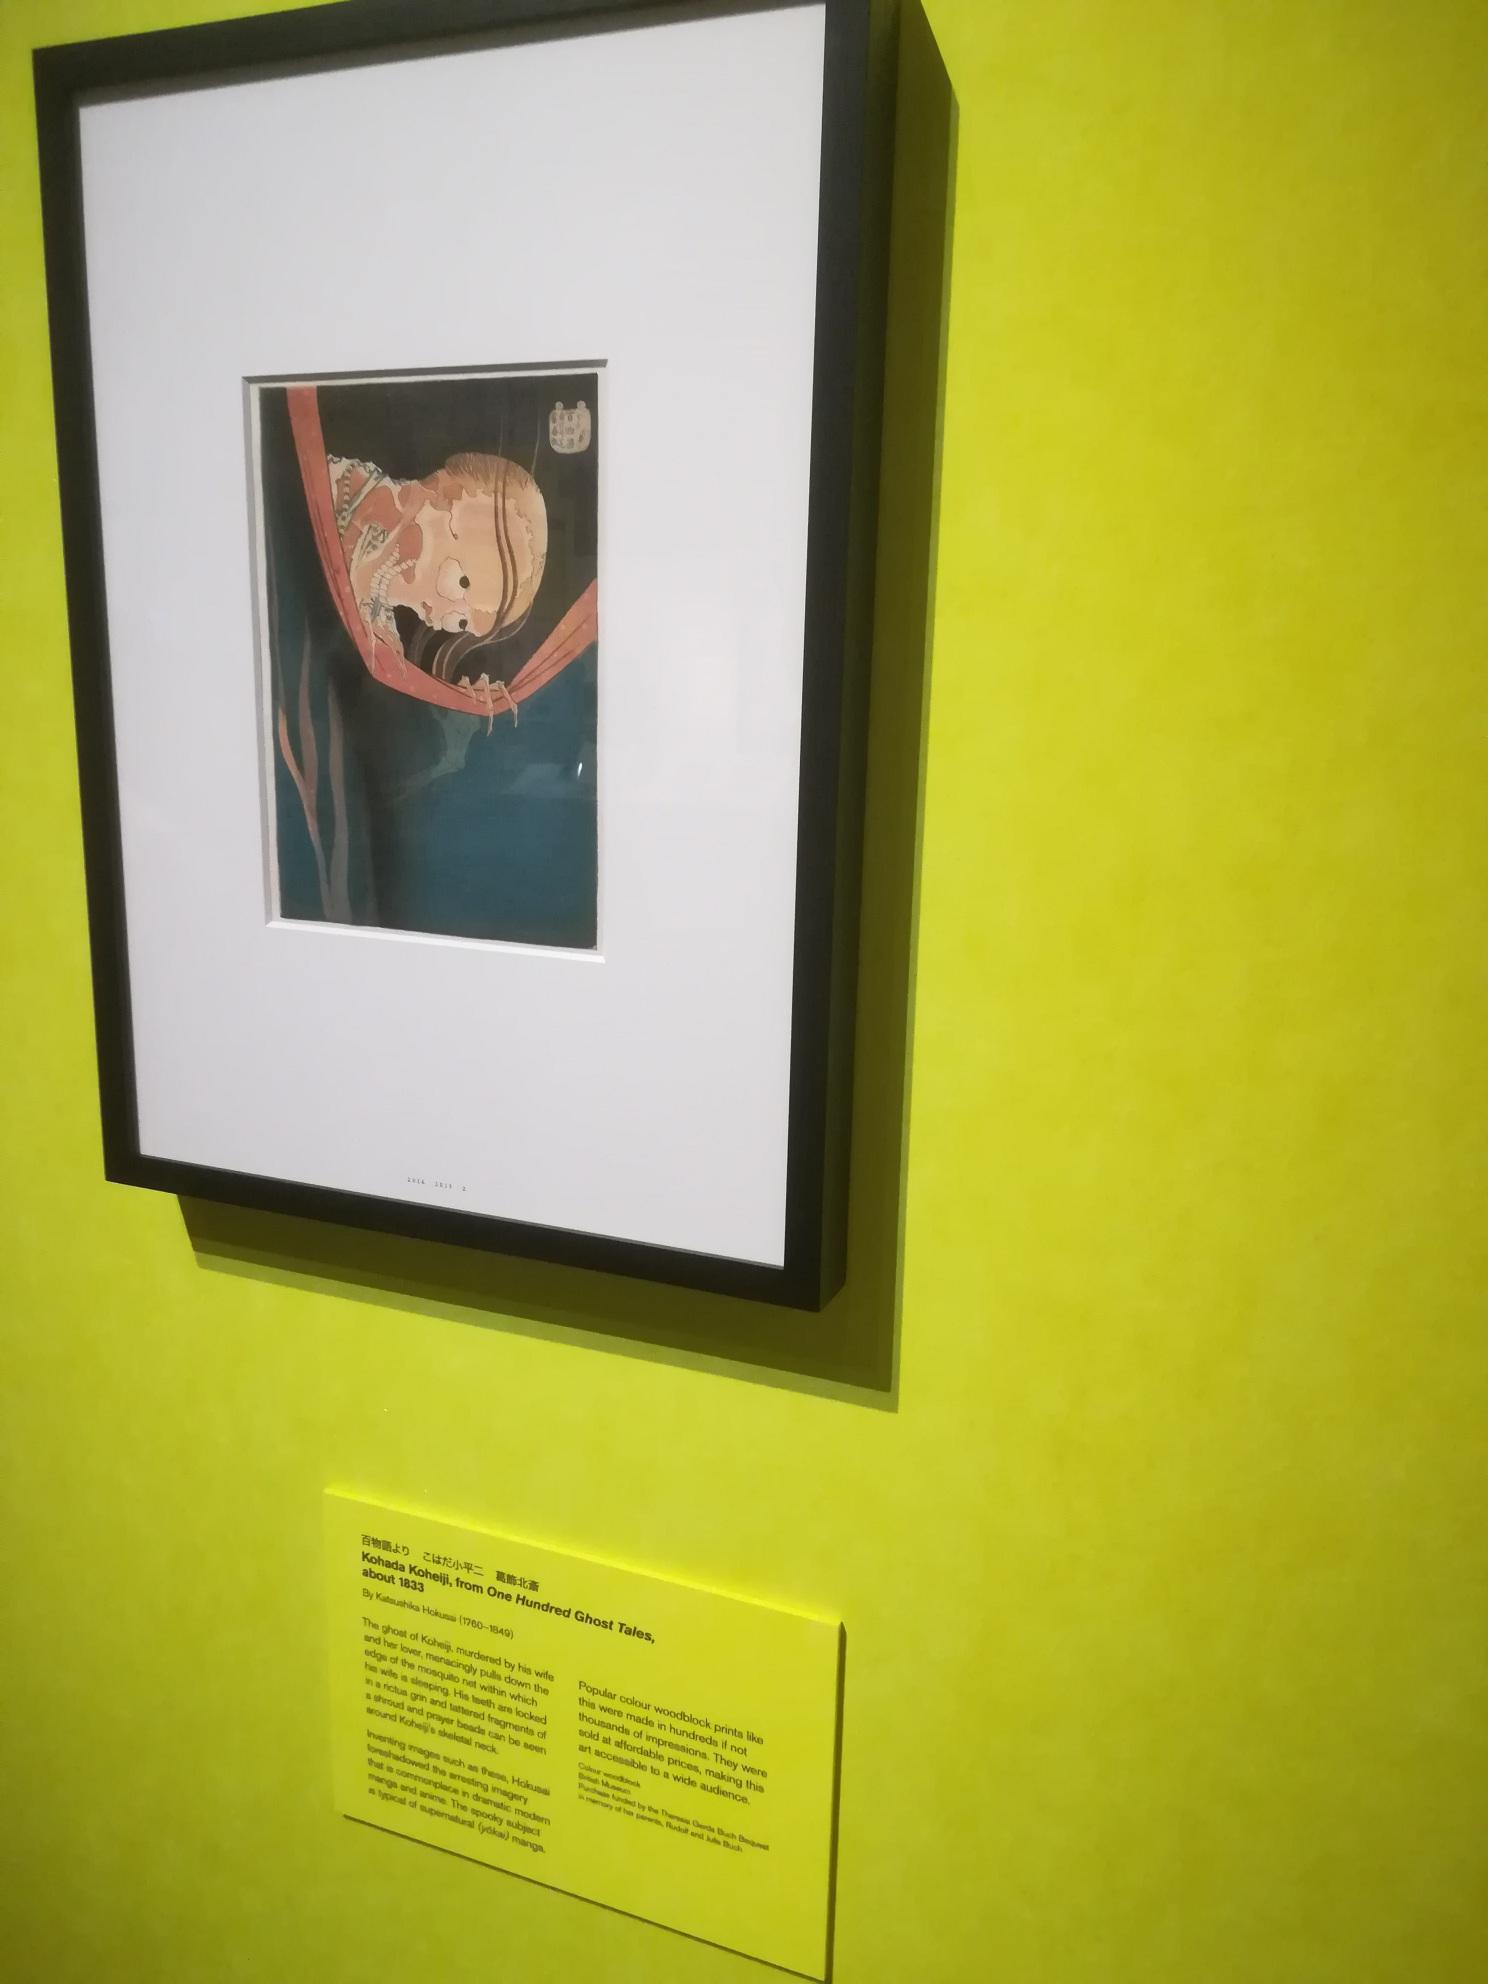 Manga Exhibition at the British Museum